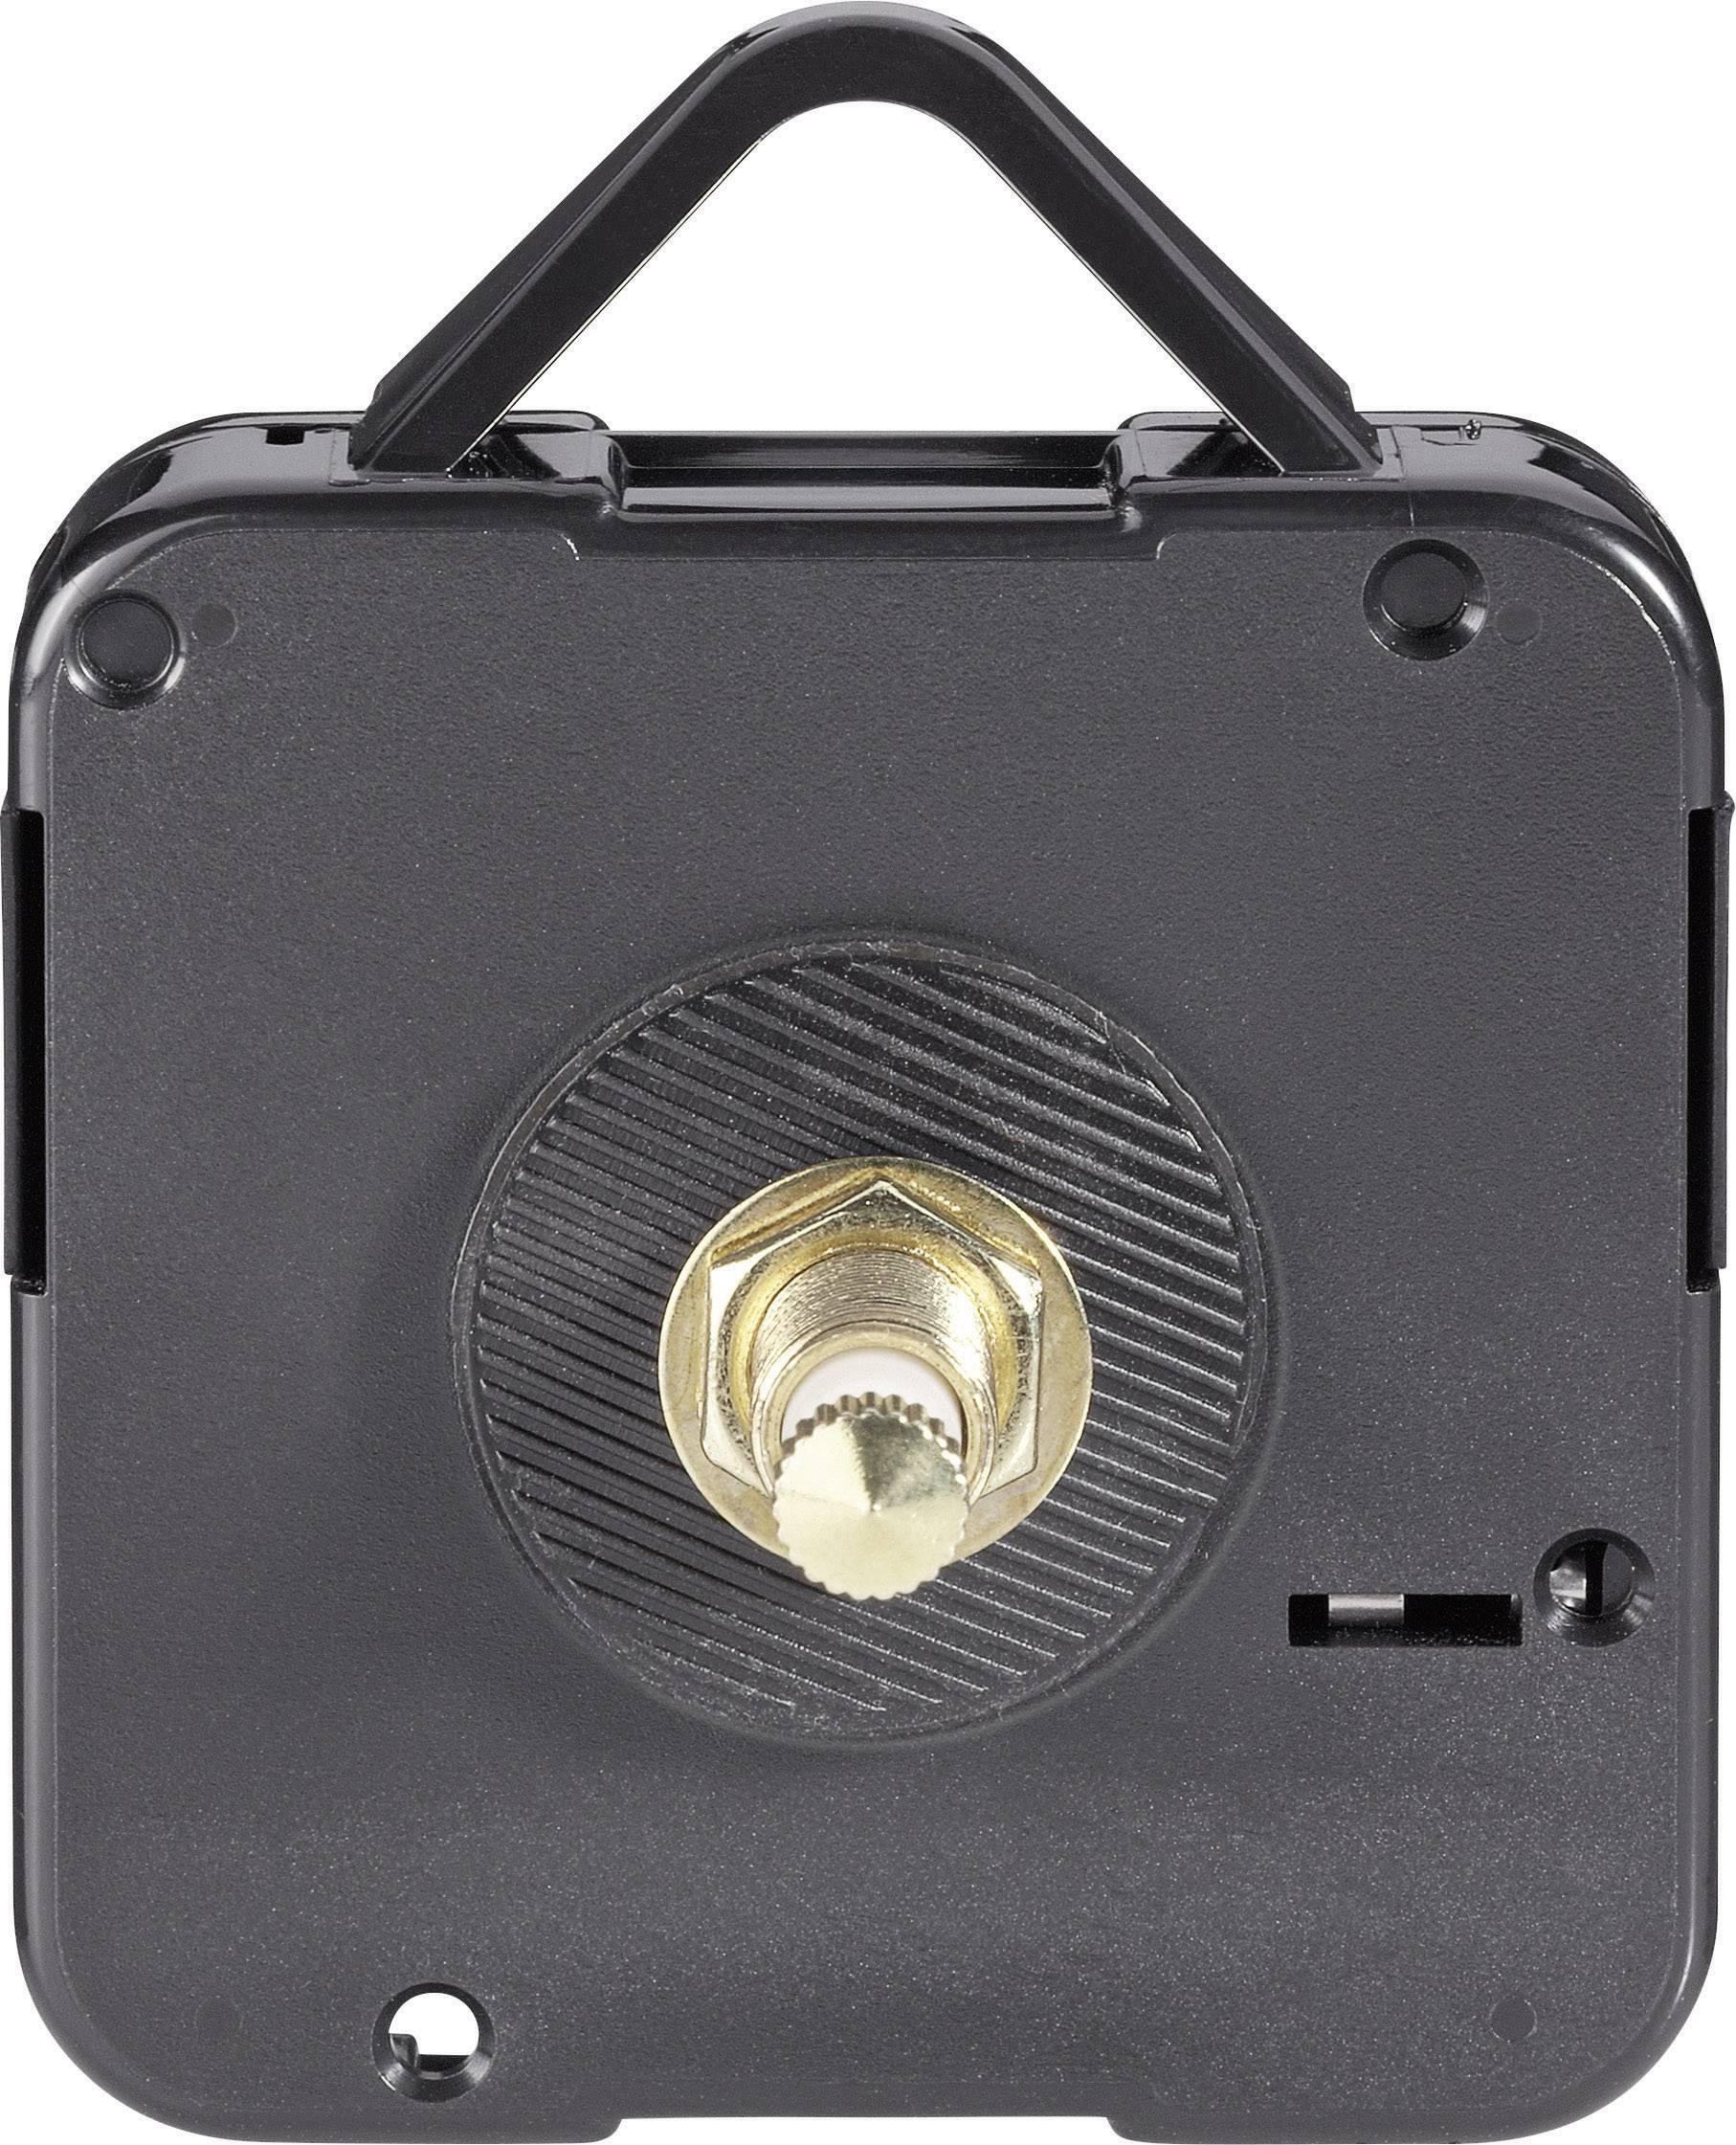 Quartz hodinový strojček HD 1688 9080c10c,16.8 mm